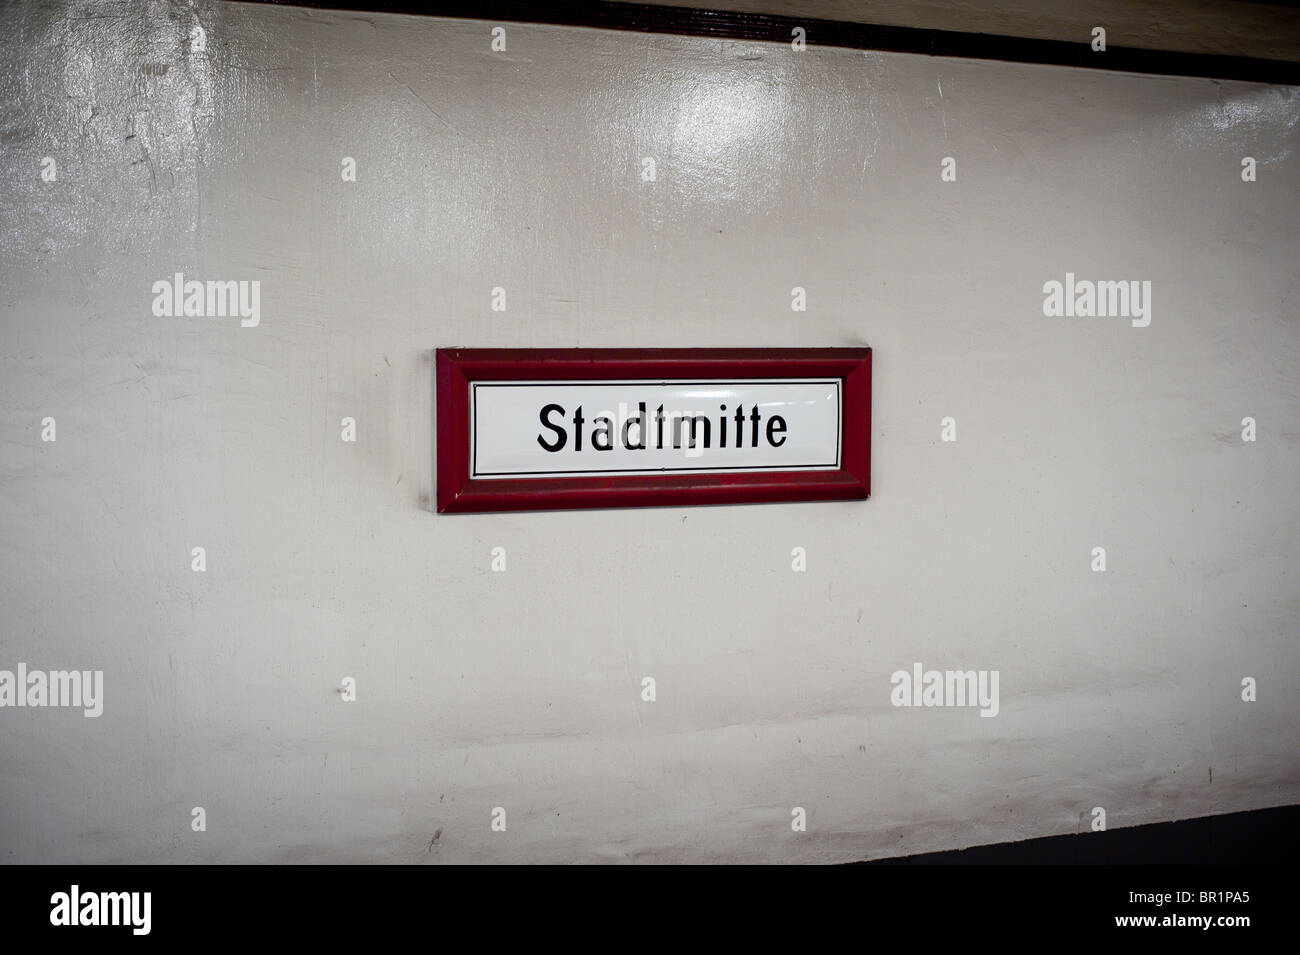 Stadtmitte Subway sign - Stock Image